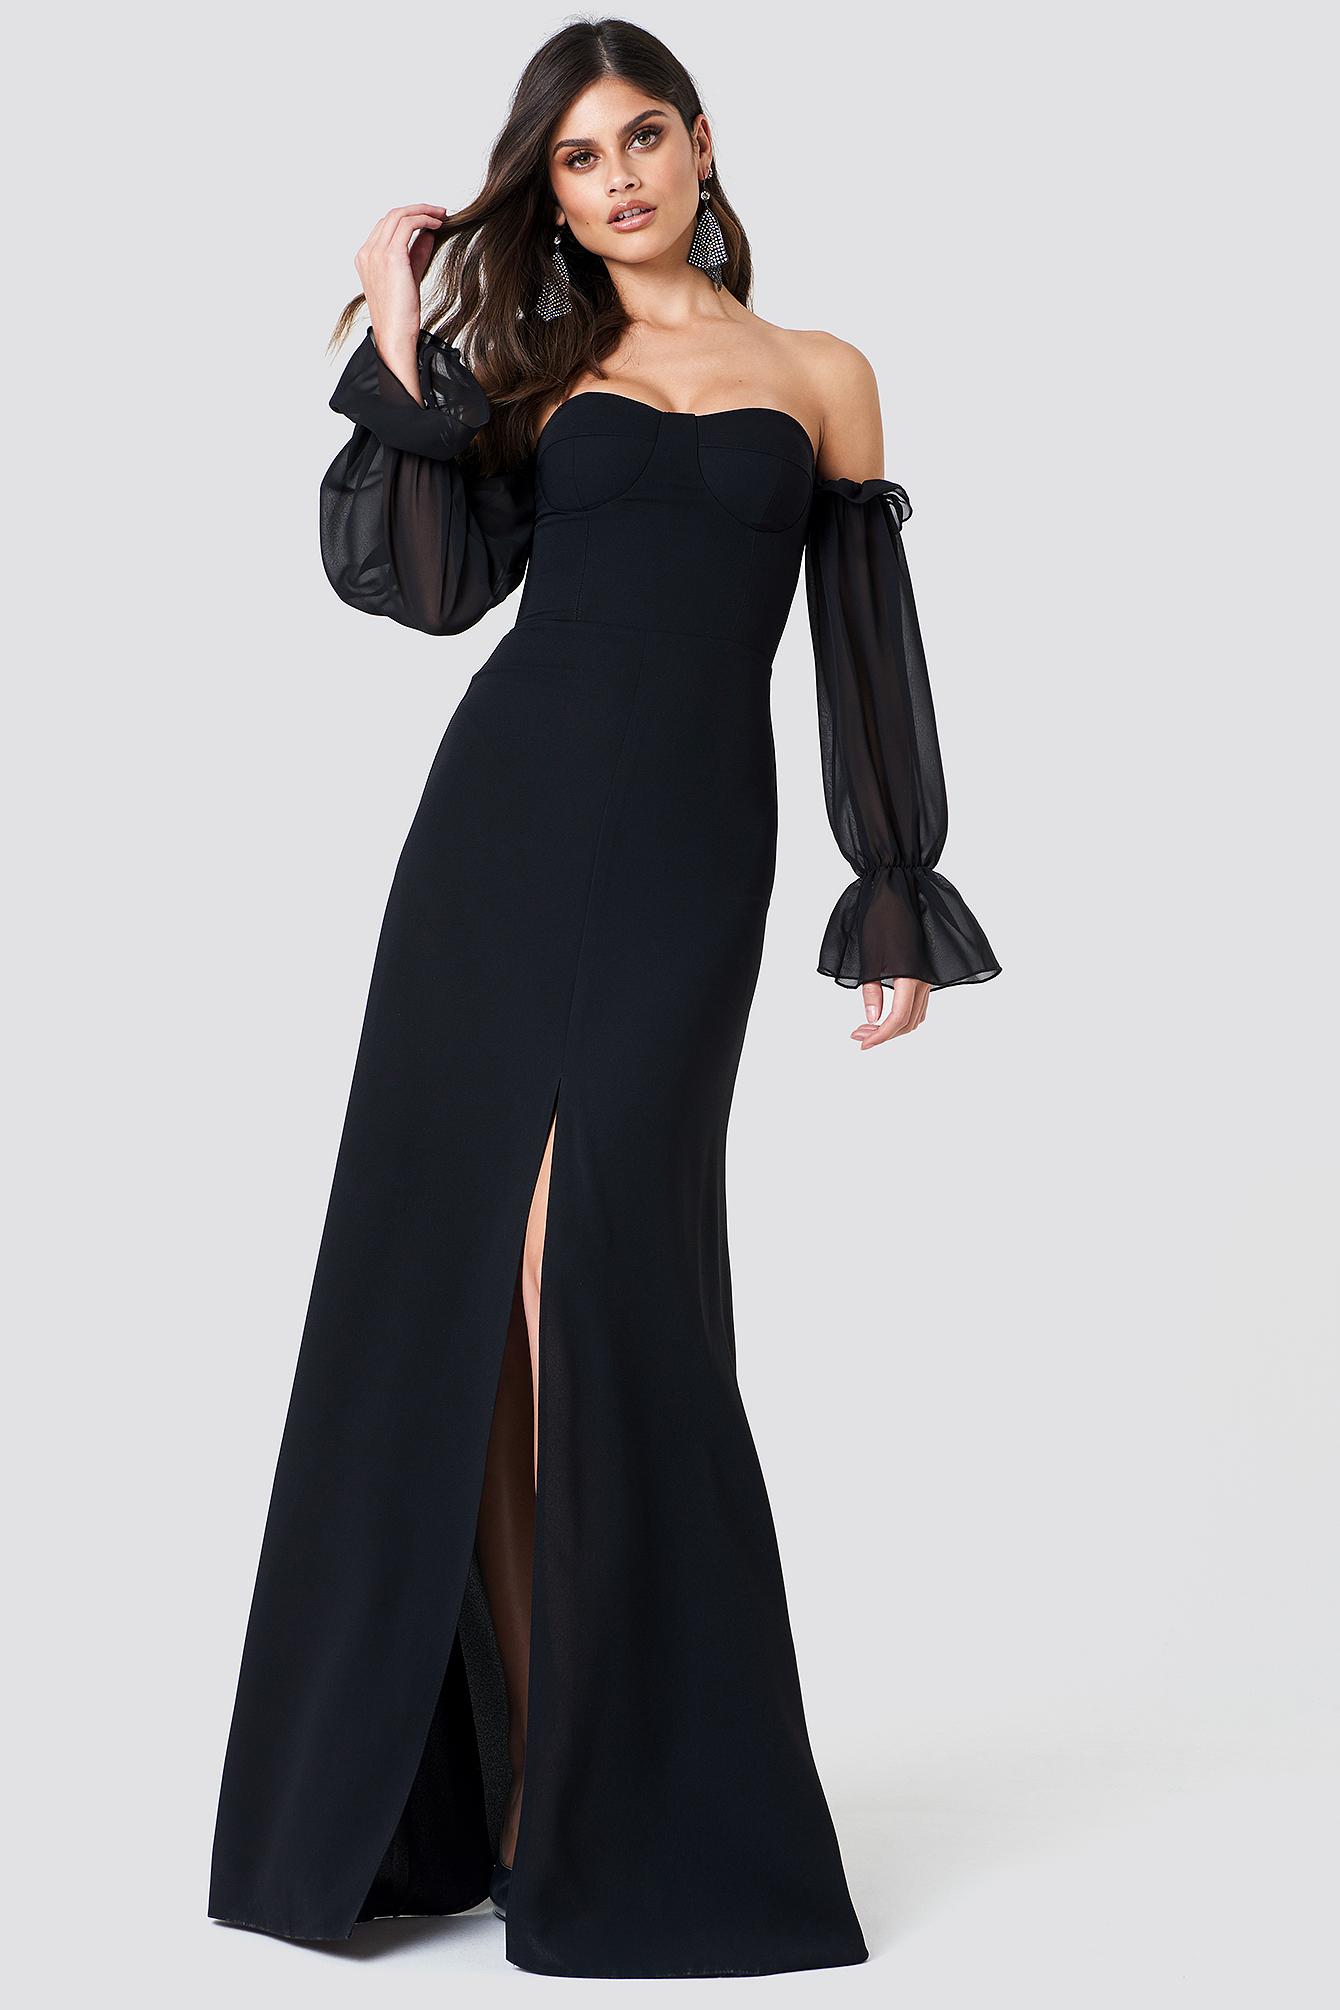 Sleeve Sheer Blackna Sheer Maxi Maxi Sleeve Dress Dress sxQrCBhdt